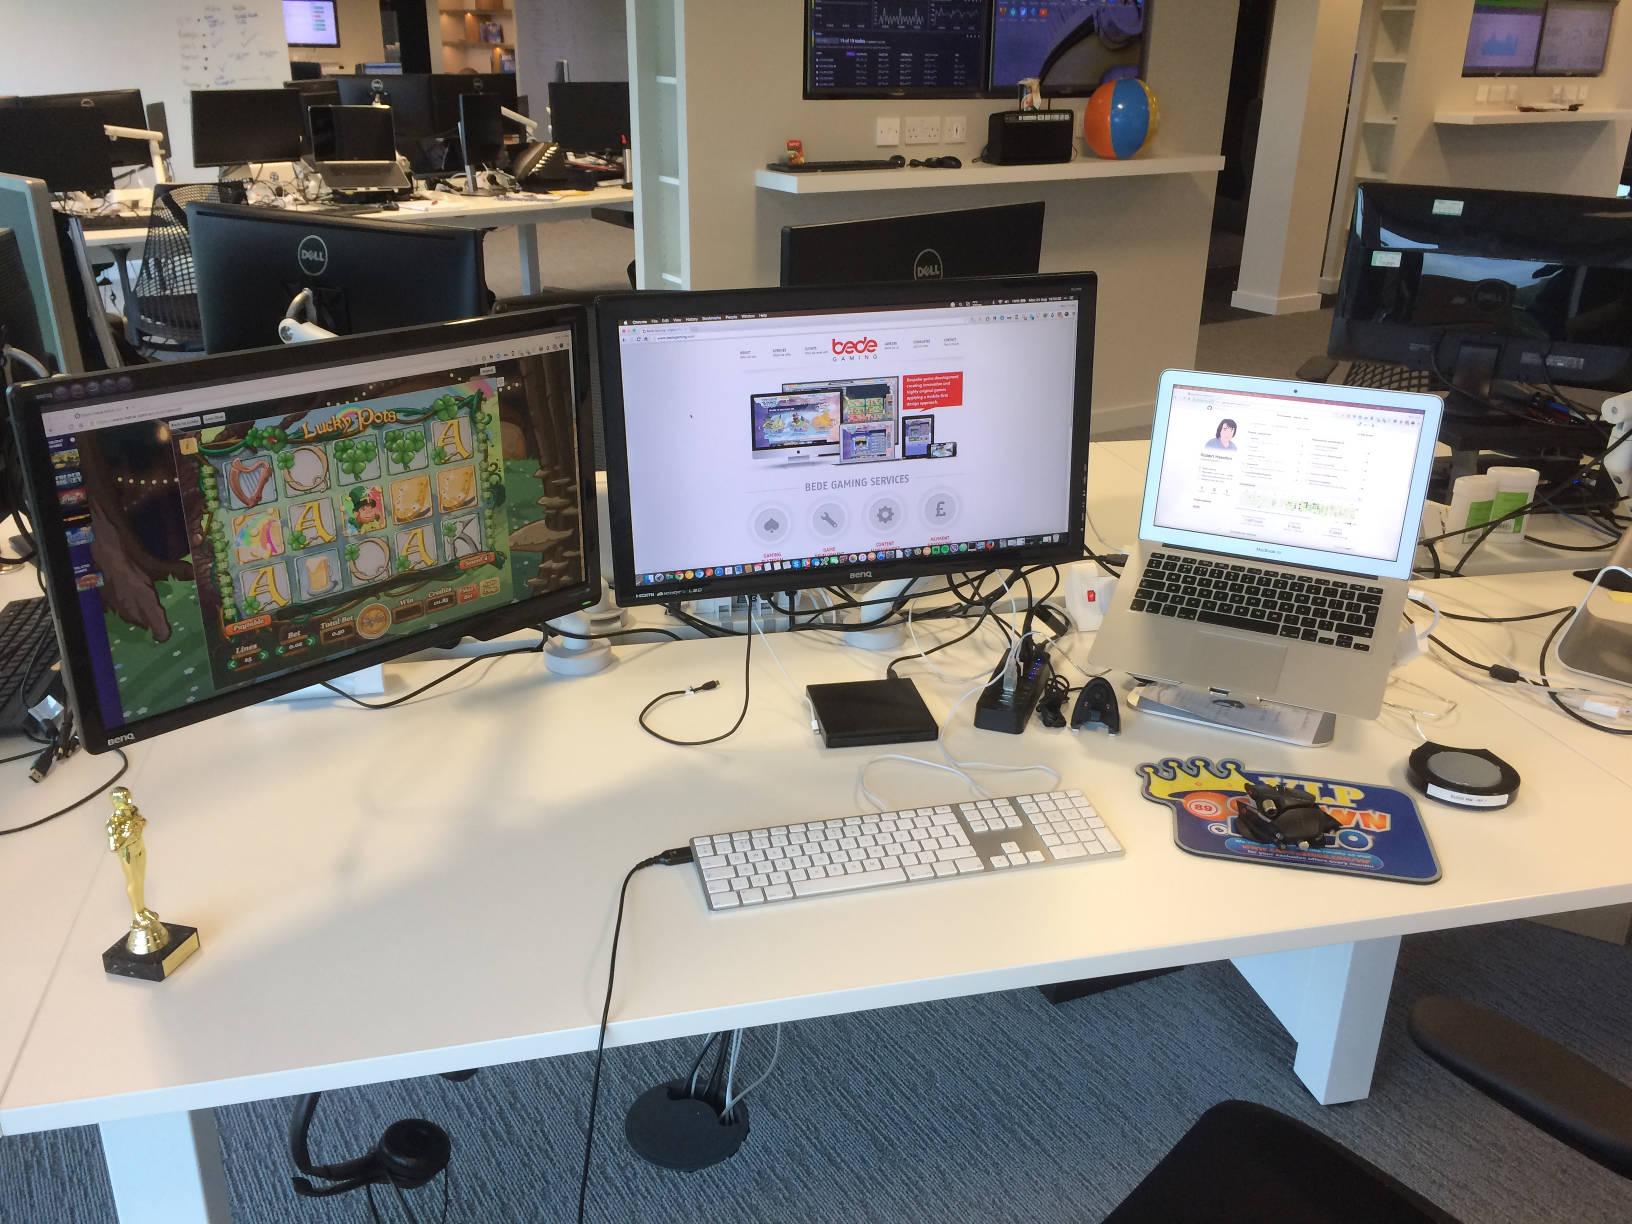 My desk at Bede Gaming.